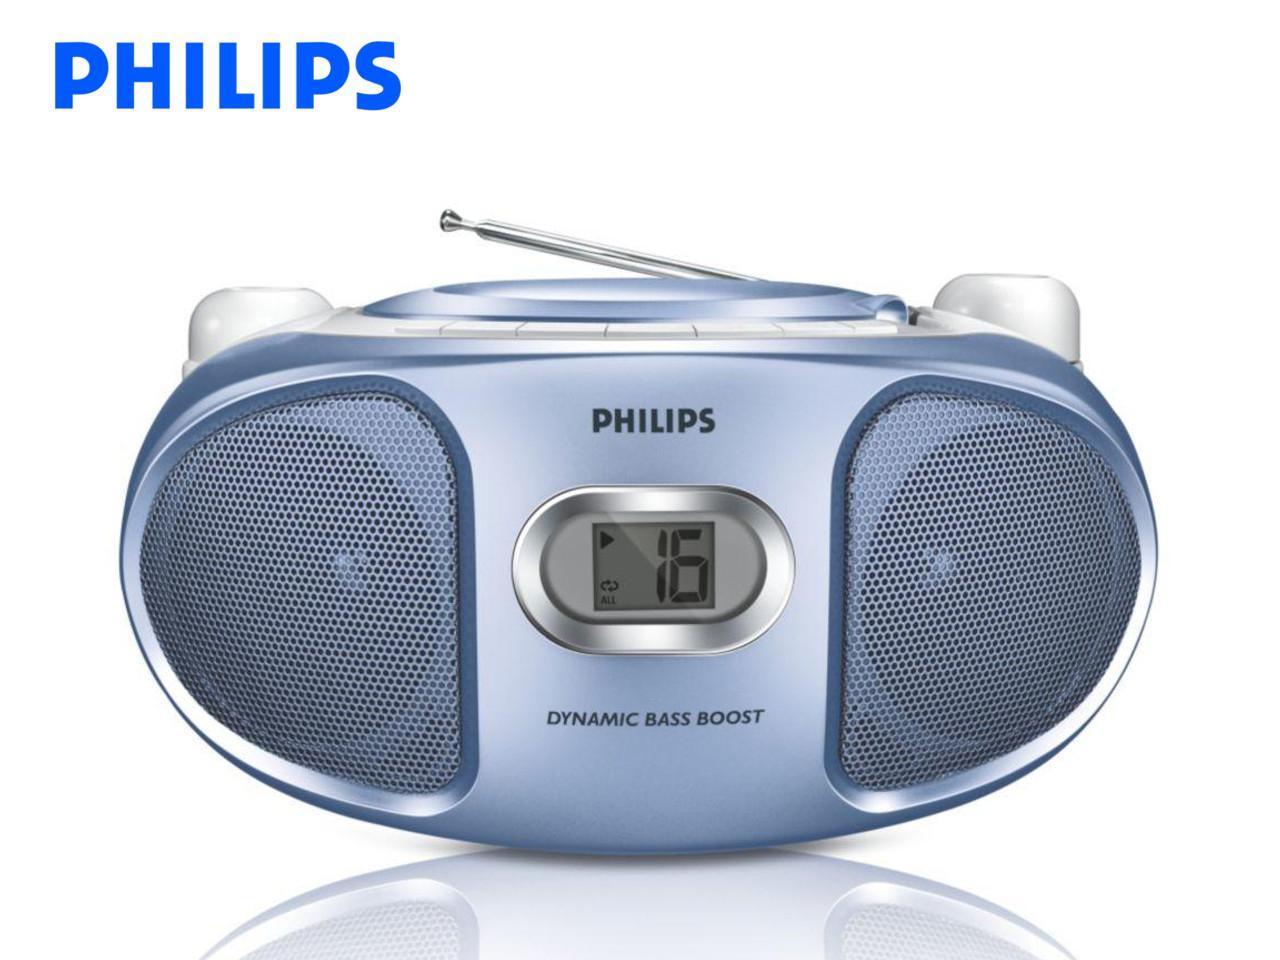 PHILIPS AZ105N | CHAT on-line podpora PO-PÁ 8-22.00!!